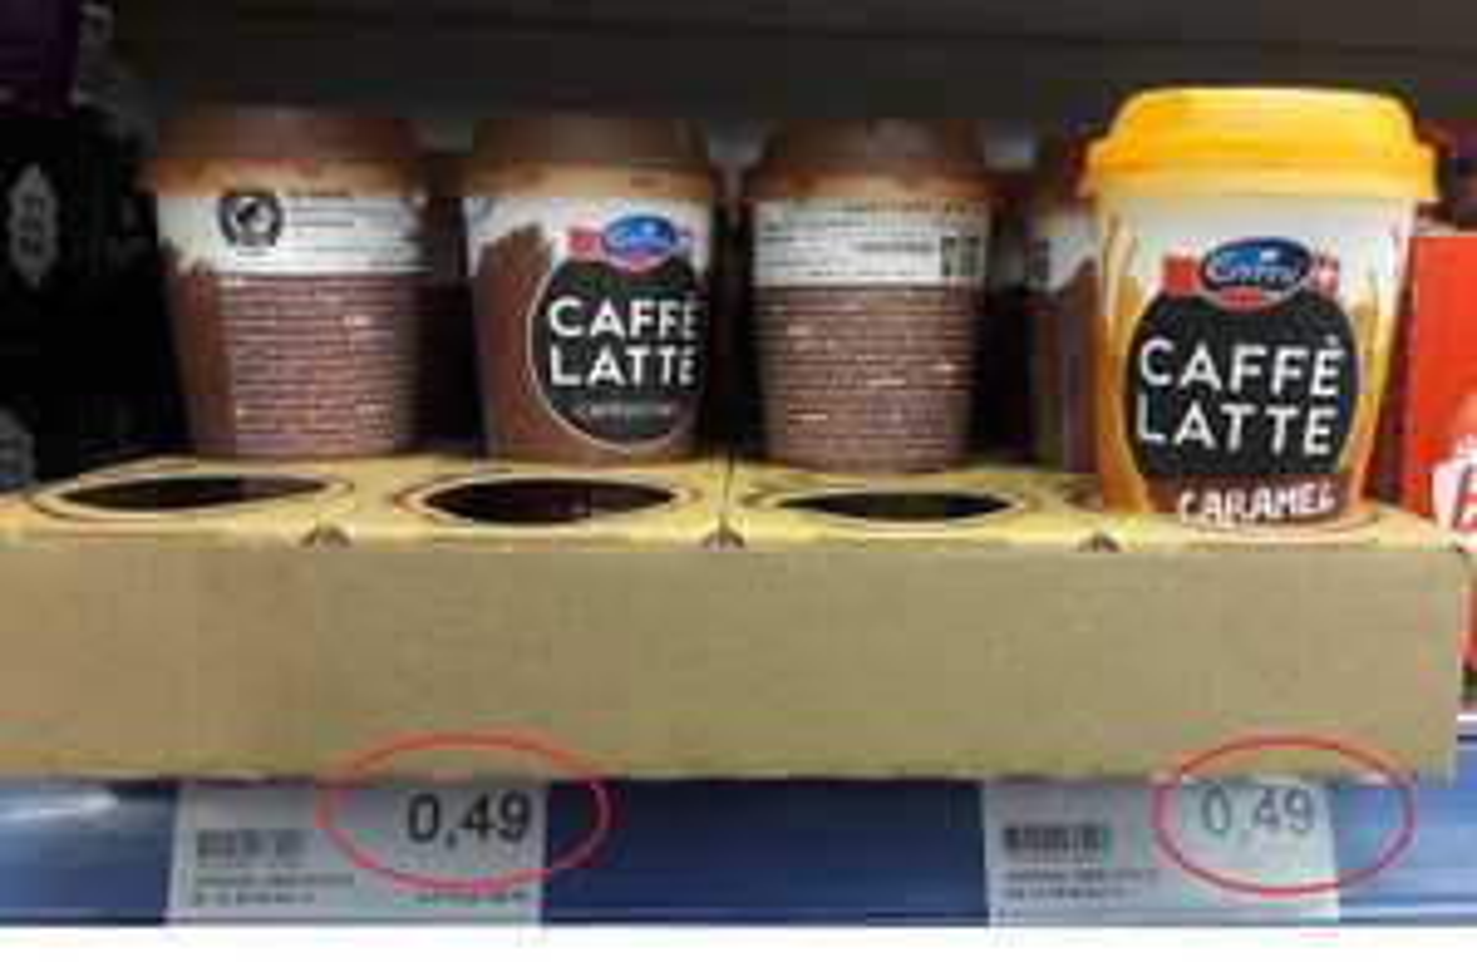 [JAWOLL+Coupies][lokal HP?] 4 Stk. Emmi CAFFÈ LATTE oder CHOCO LATTE - gratis bzw. 4c Gewinn